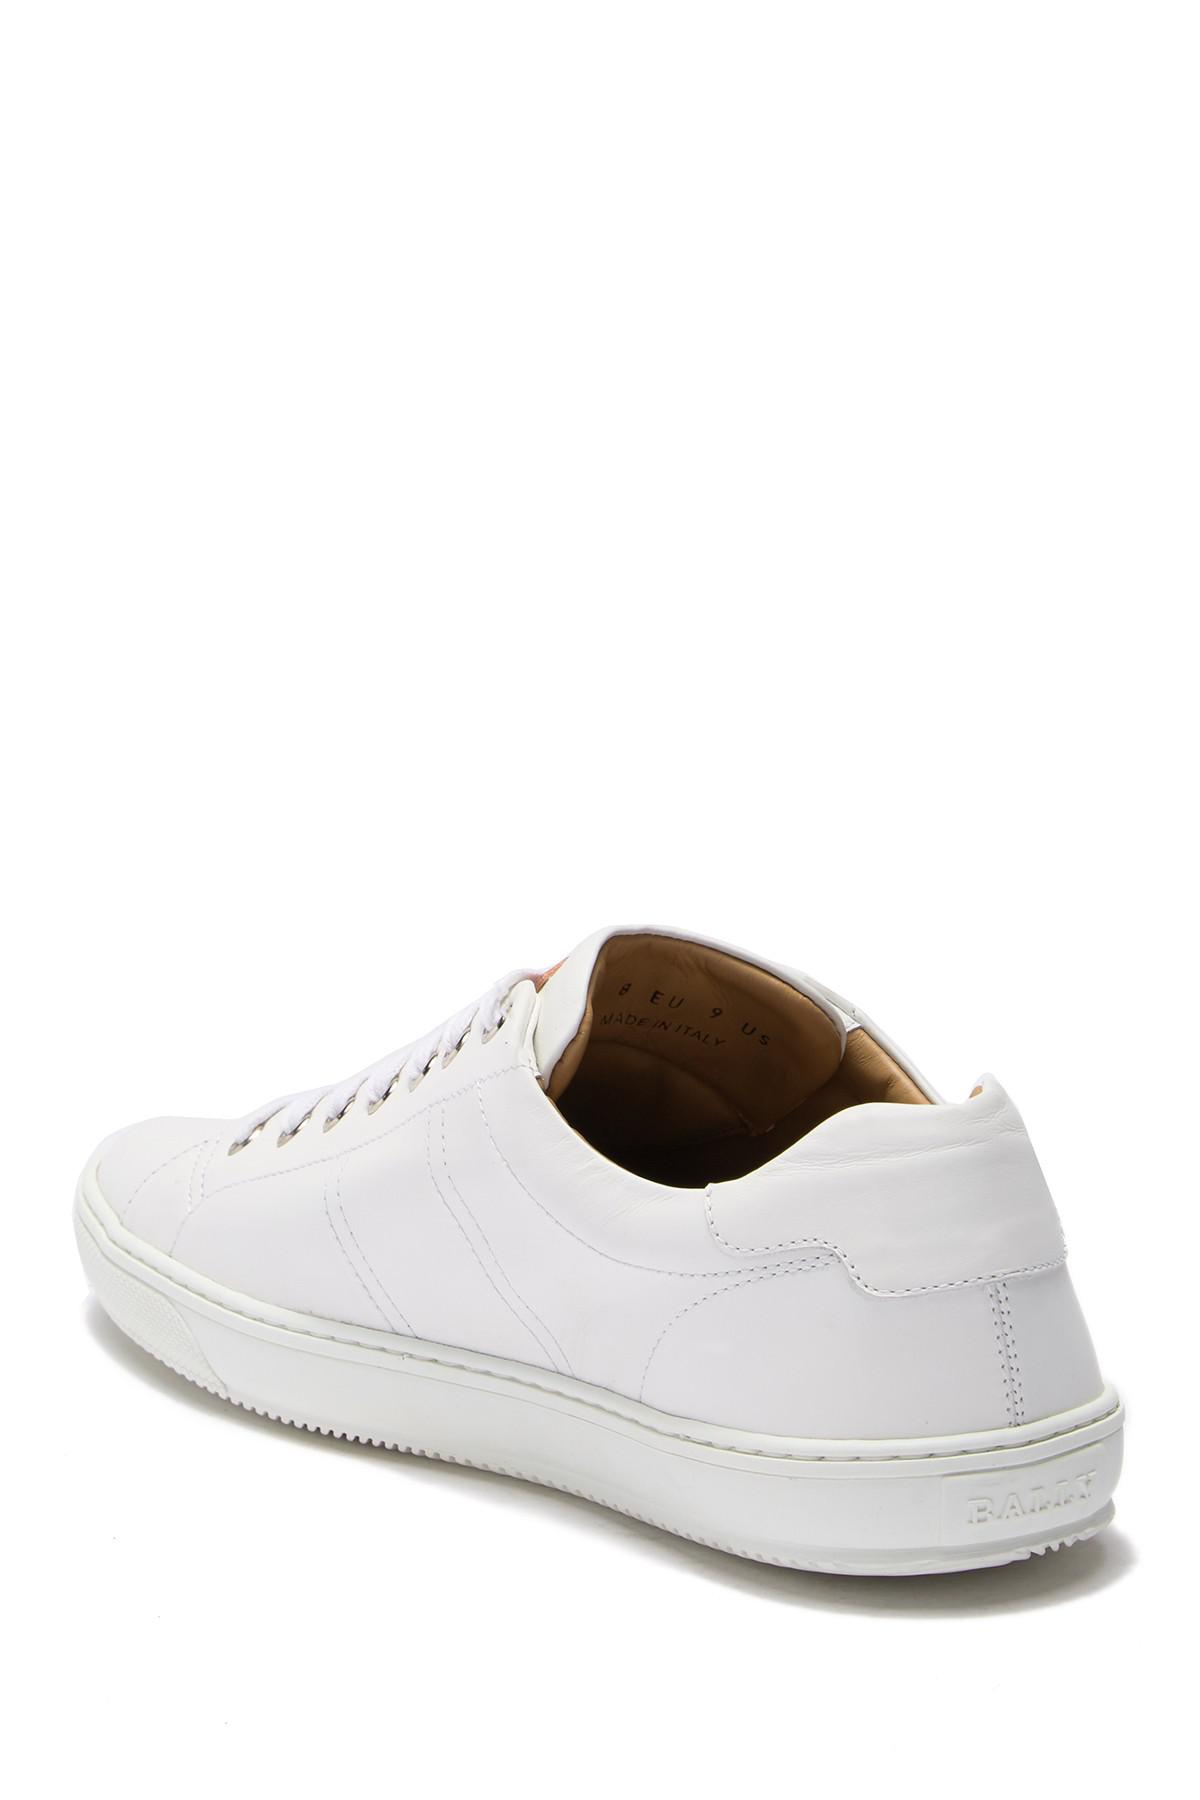 Bally Leather Orivel Calf Plain Sneaker